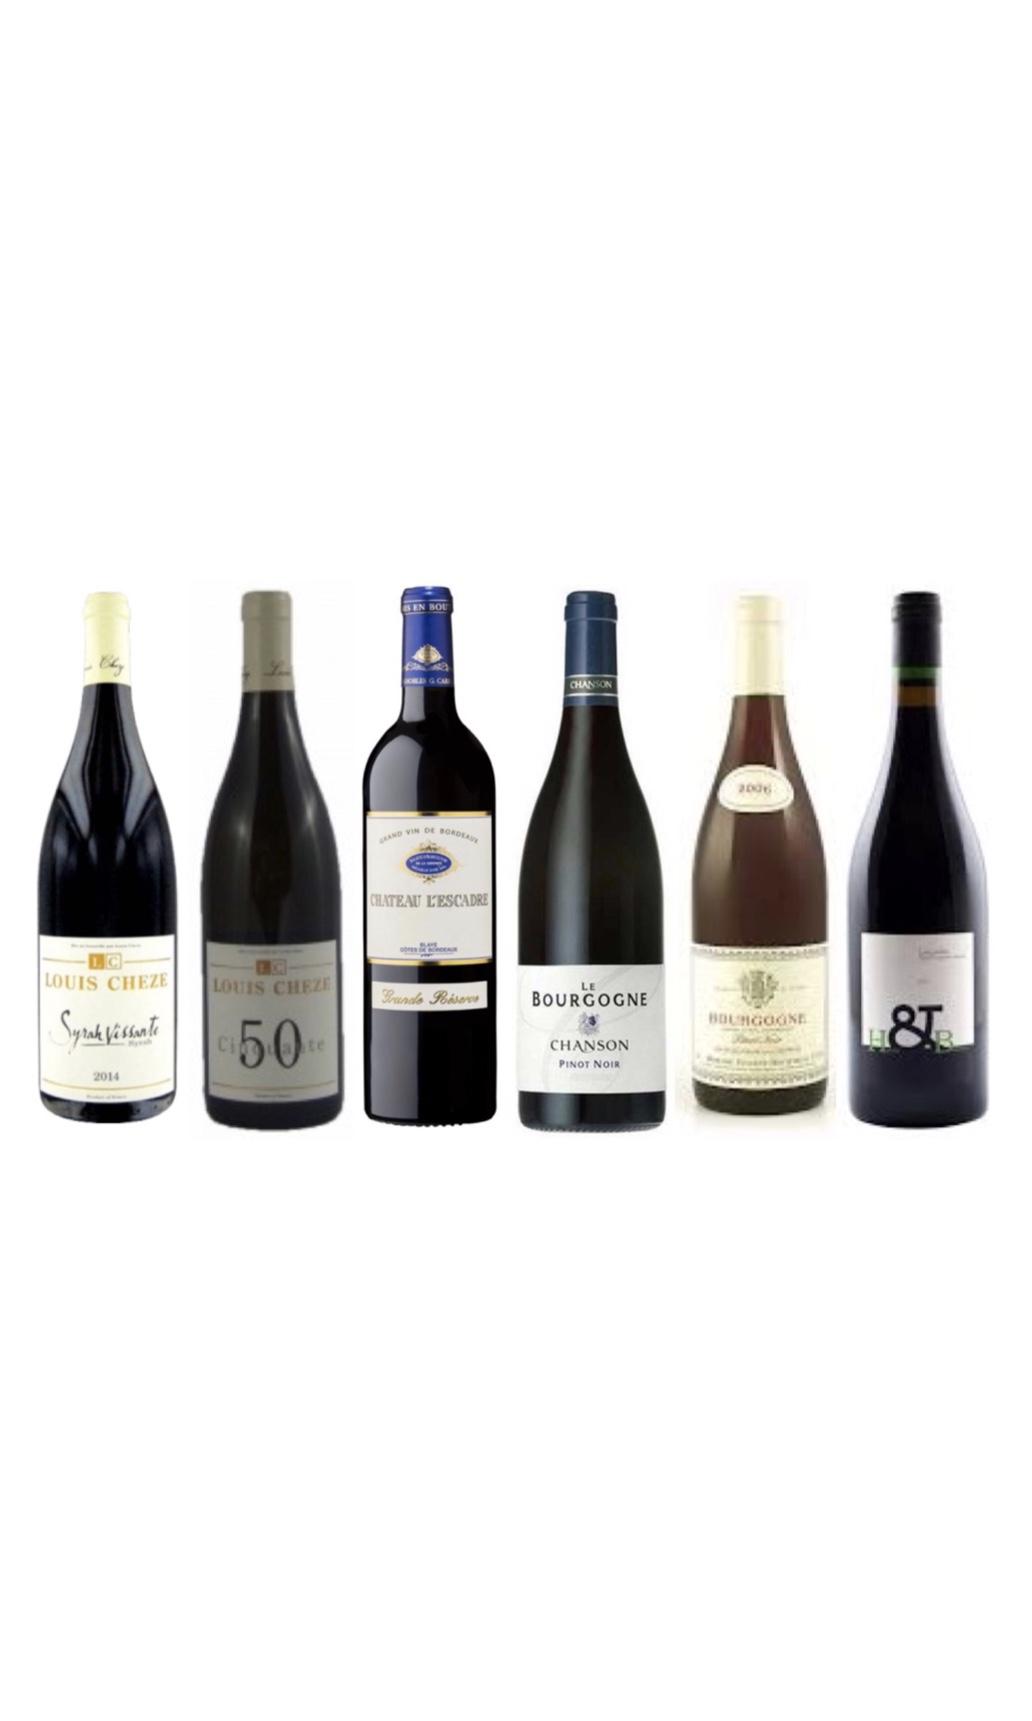 French Red wine tasting bundle